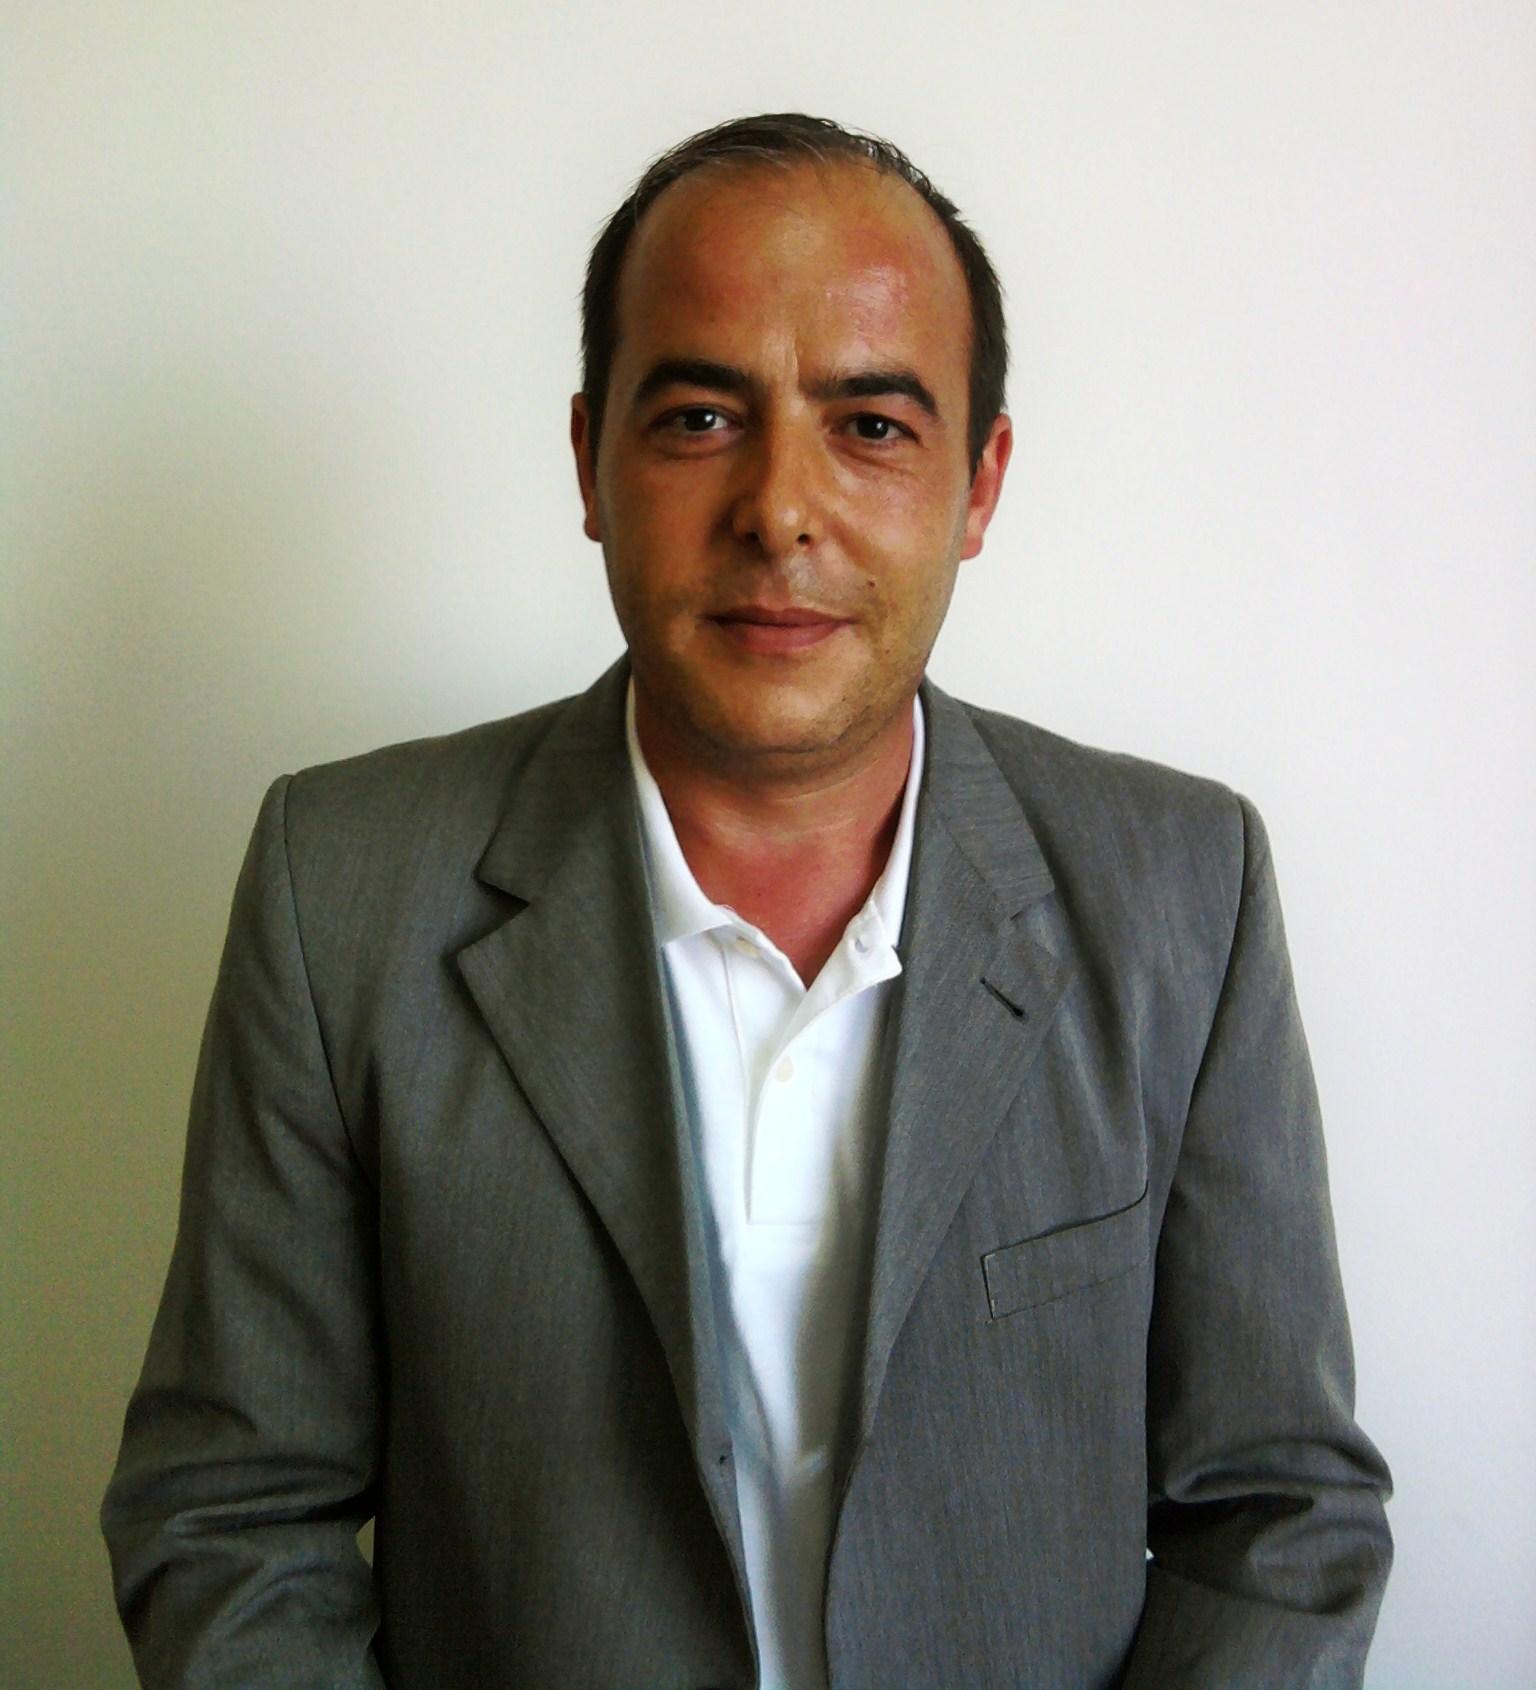 Michele Ruiu - Assessore Risorse Umane e Finanziarie, Cooperazione Internazionale Nuoro